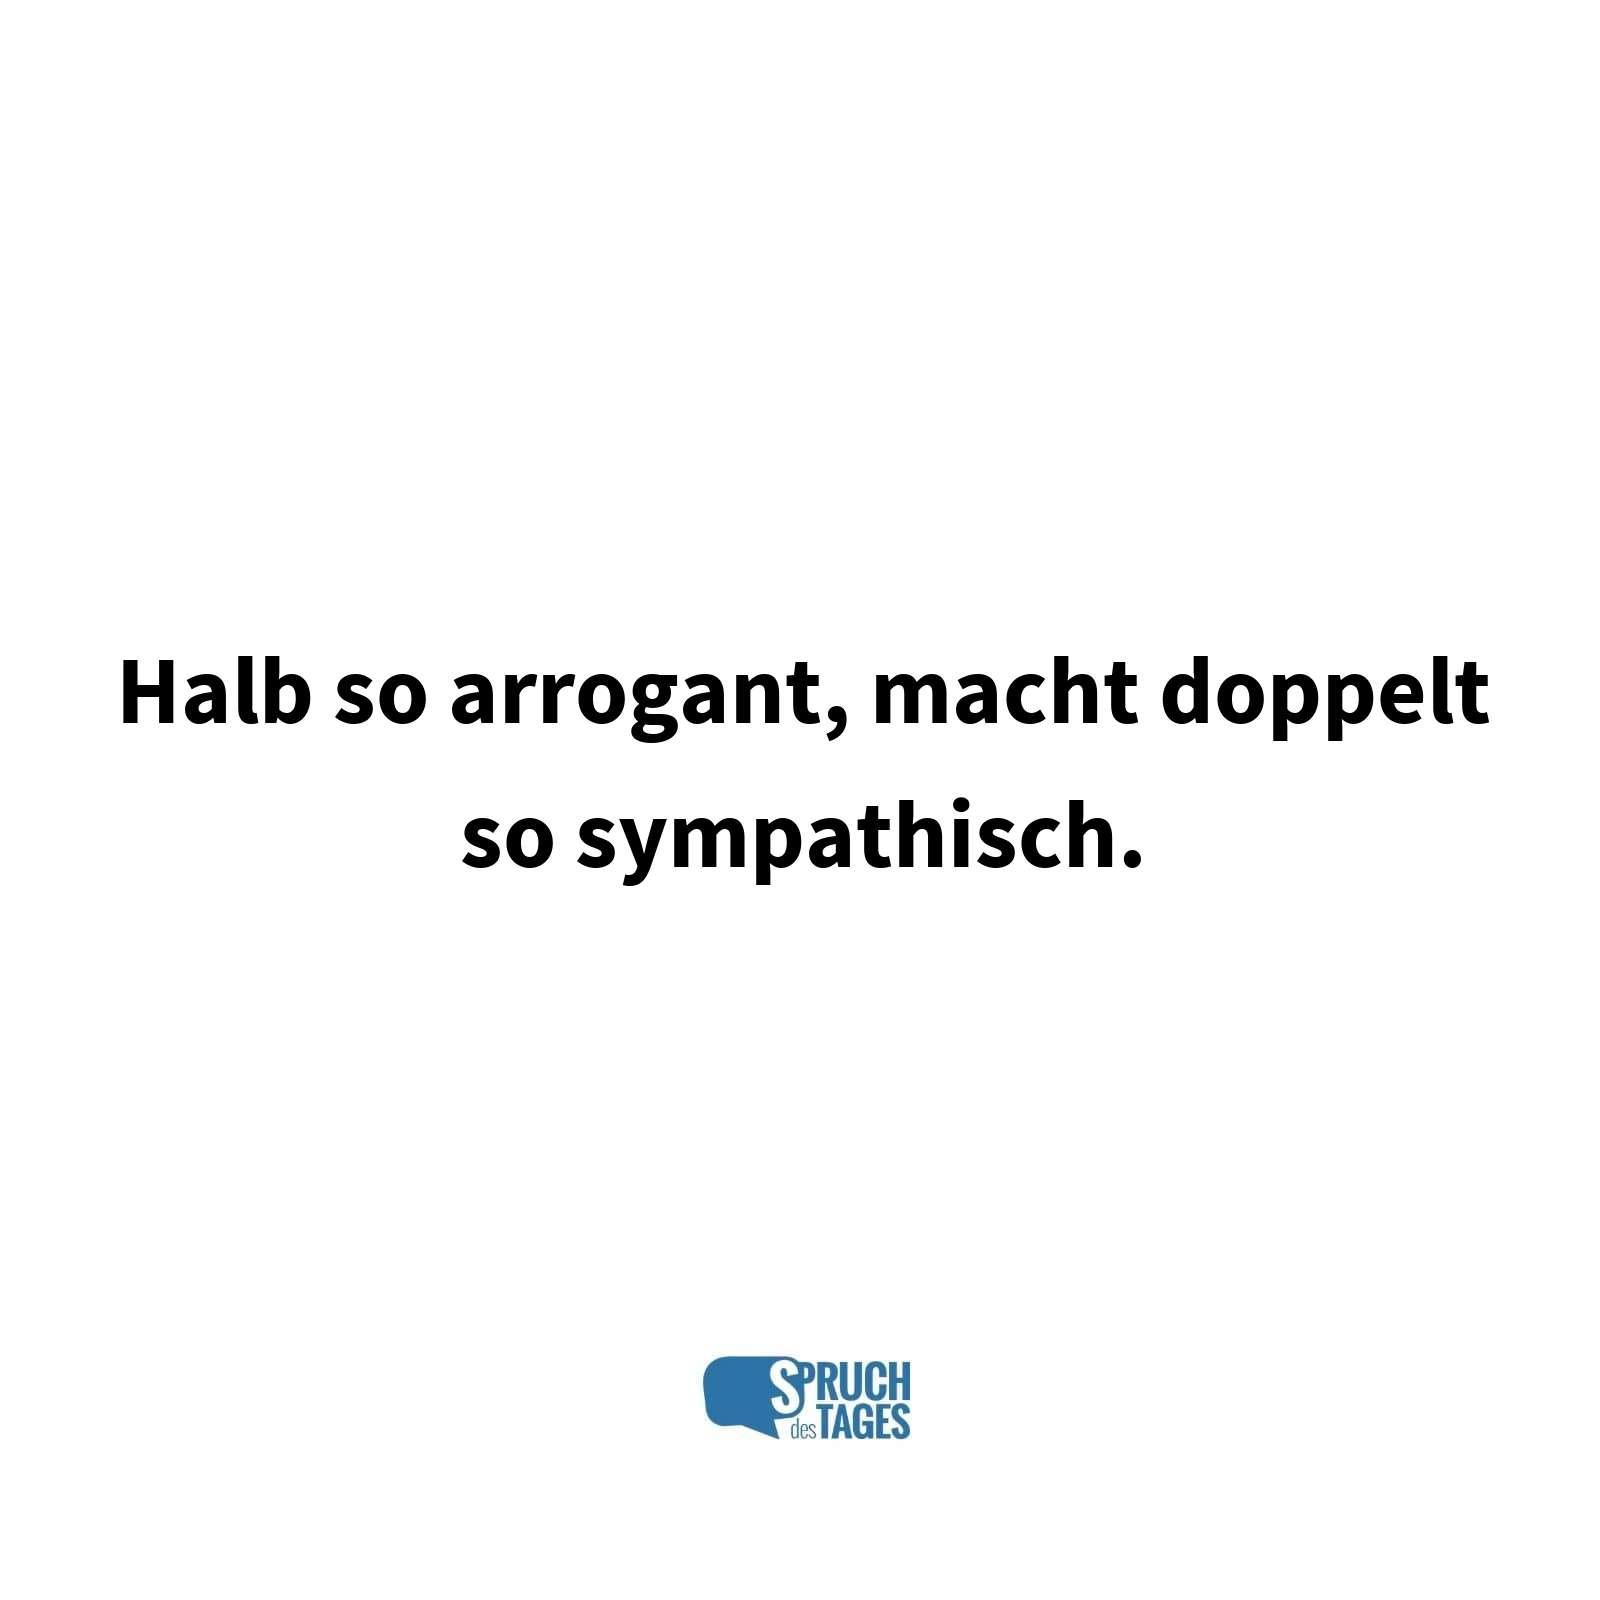 sprüche arrogant Halb so arrogant, macht doppelt so sympathisch. sprüche arrogant